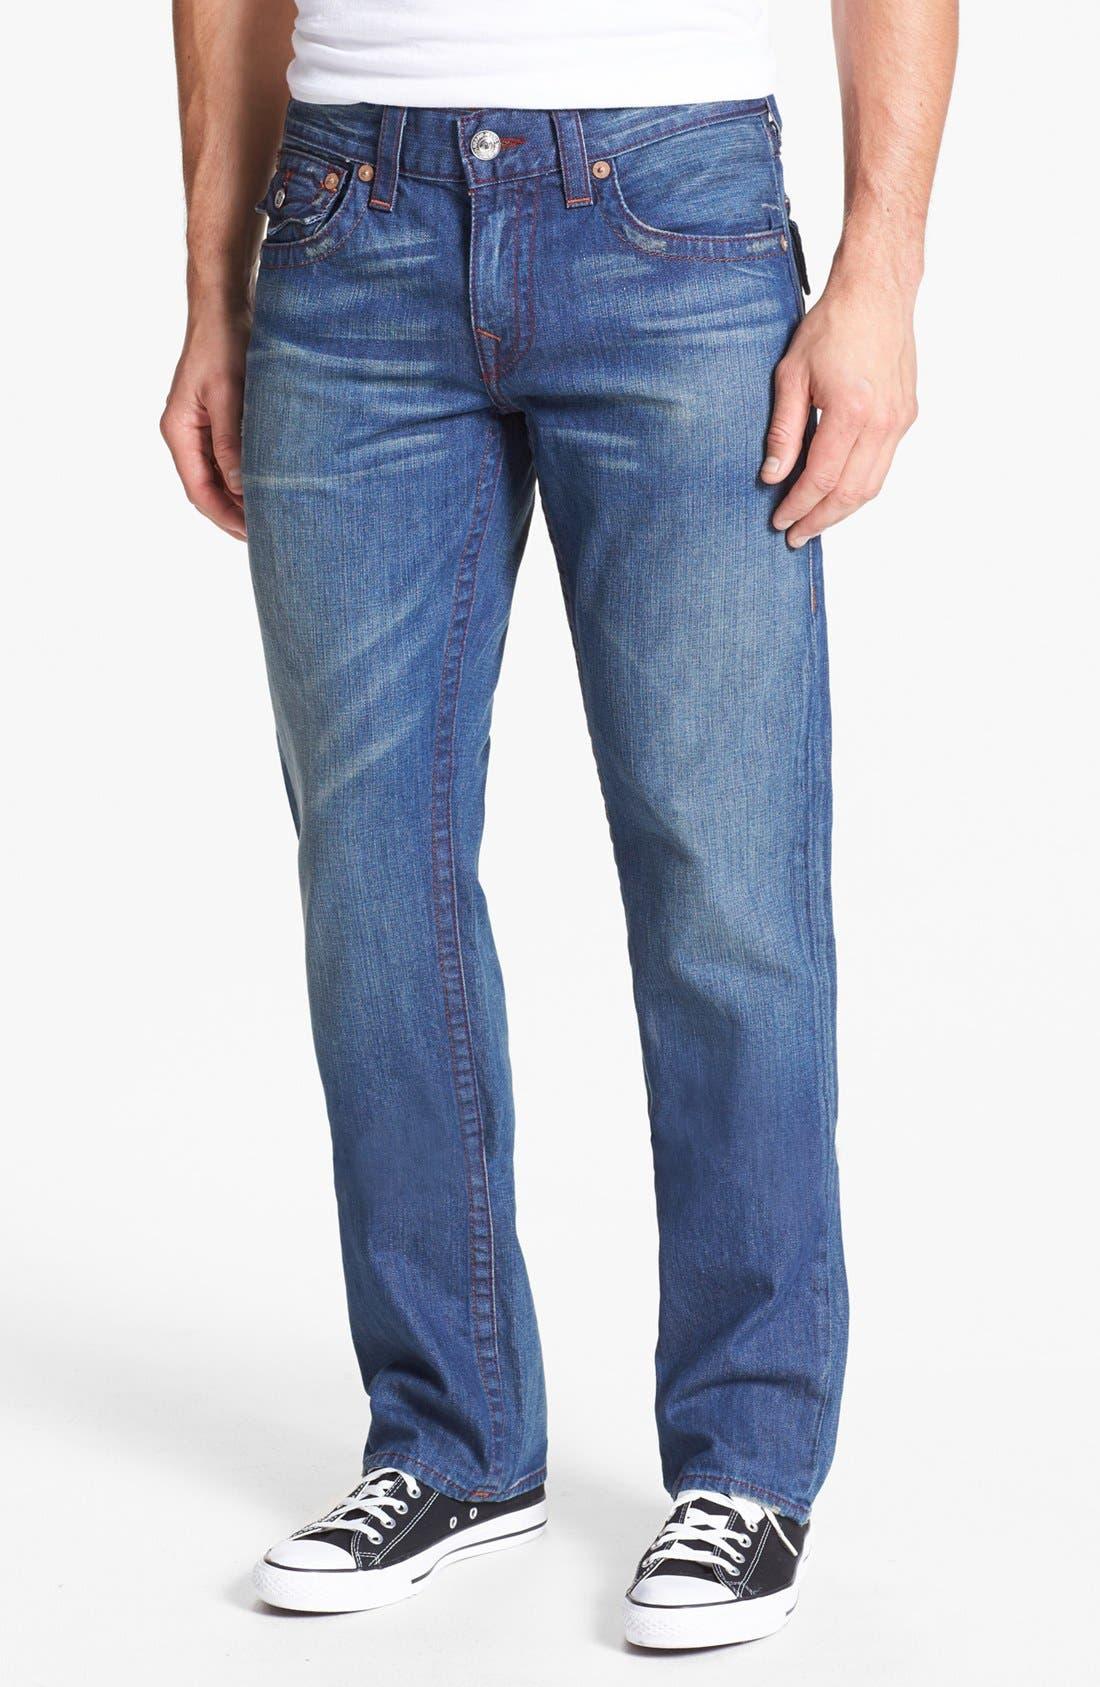 Alternate Image 2  - True Religion Brand Jeans 'Ricky' Straight Leg Jeans (Medium Drifter)